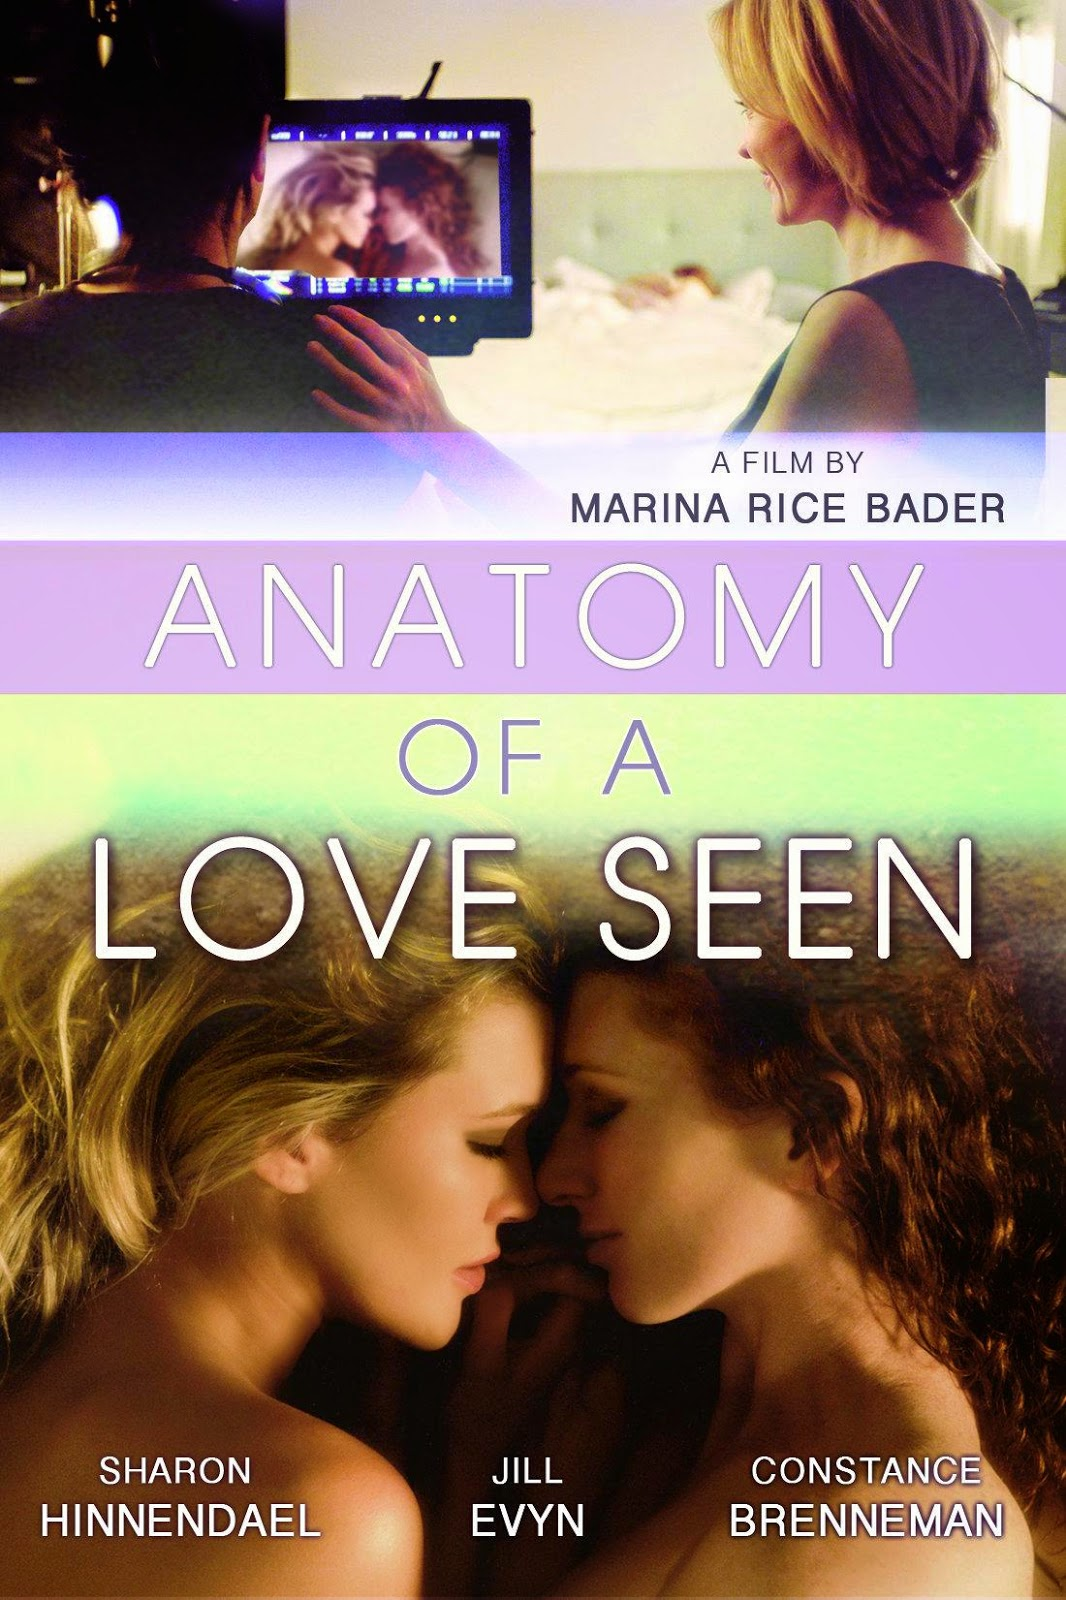 Anatomy Of A Love Seen (2014) ταινιες online seires oipeirates greek subs